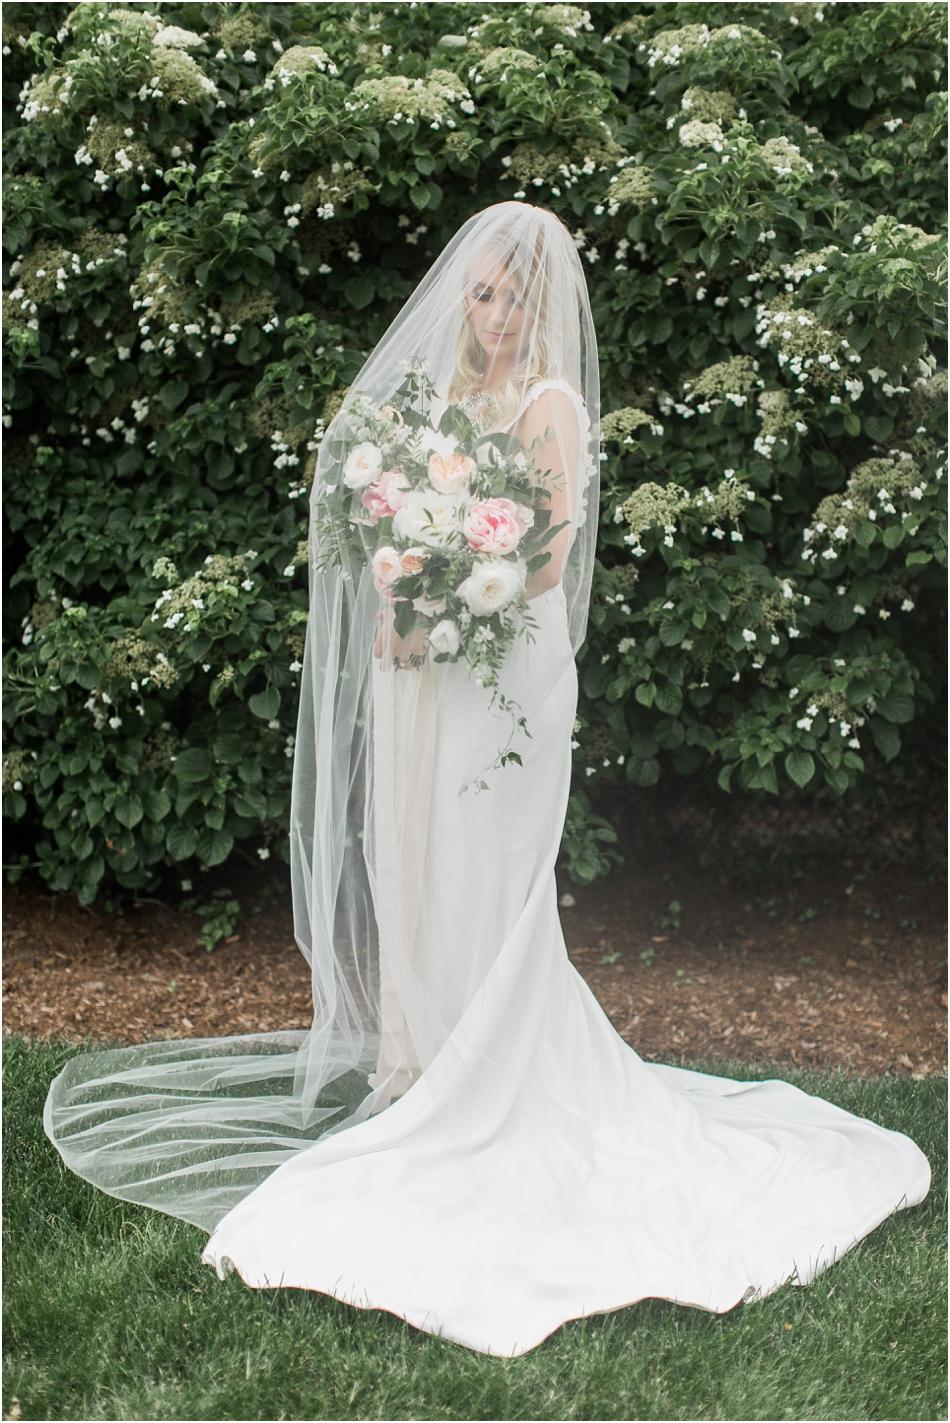 brunch_style_me_pretty_dennis_inn__always_yours_events_wild_dahlia_massachusetts_cape_cod_new_england_wedding_photographer_Meredith_Jane_Photography_photo_2126.jpg